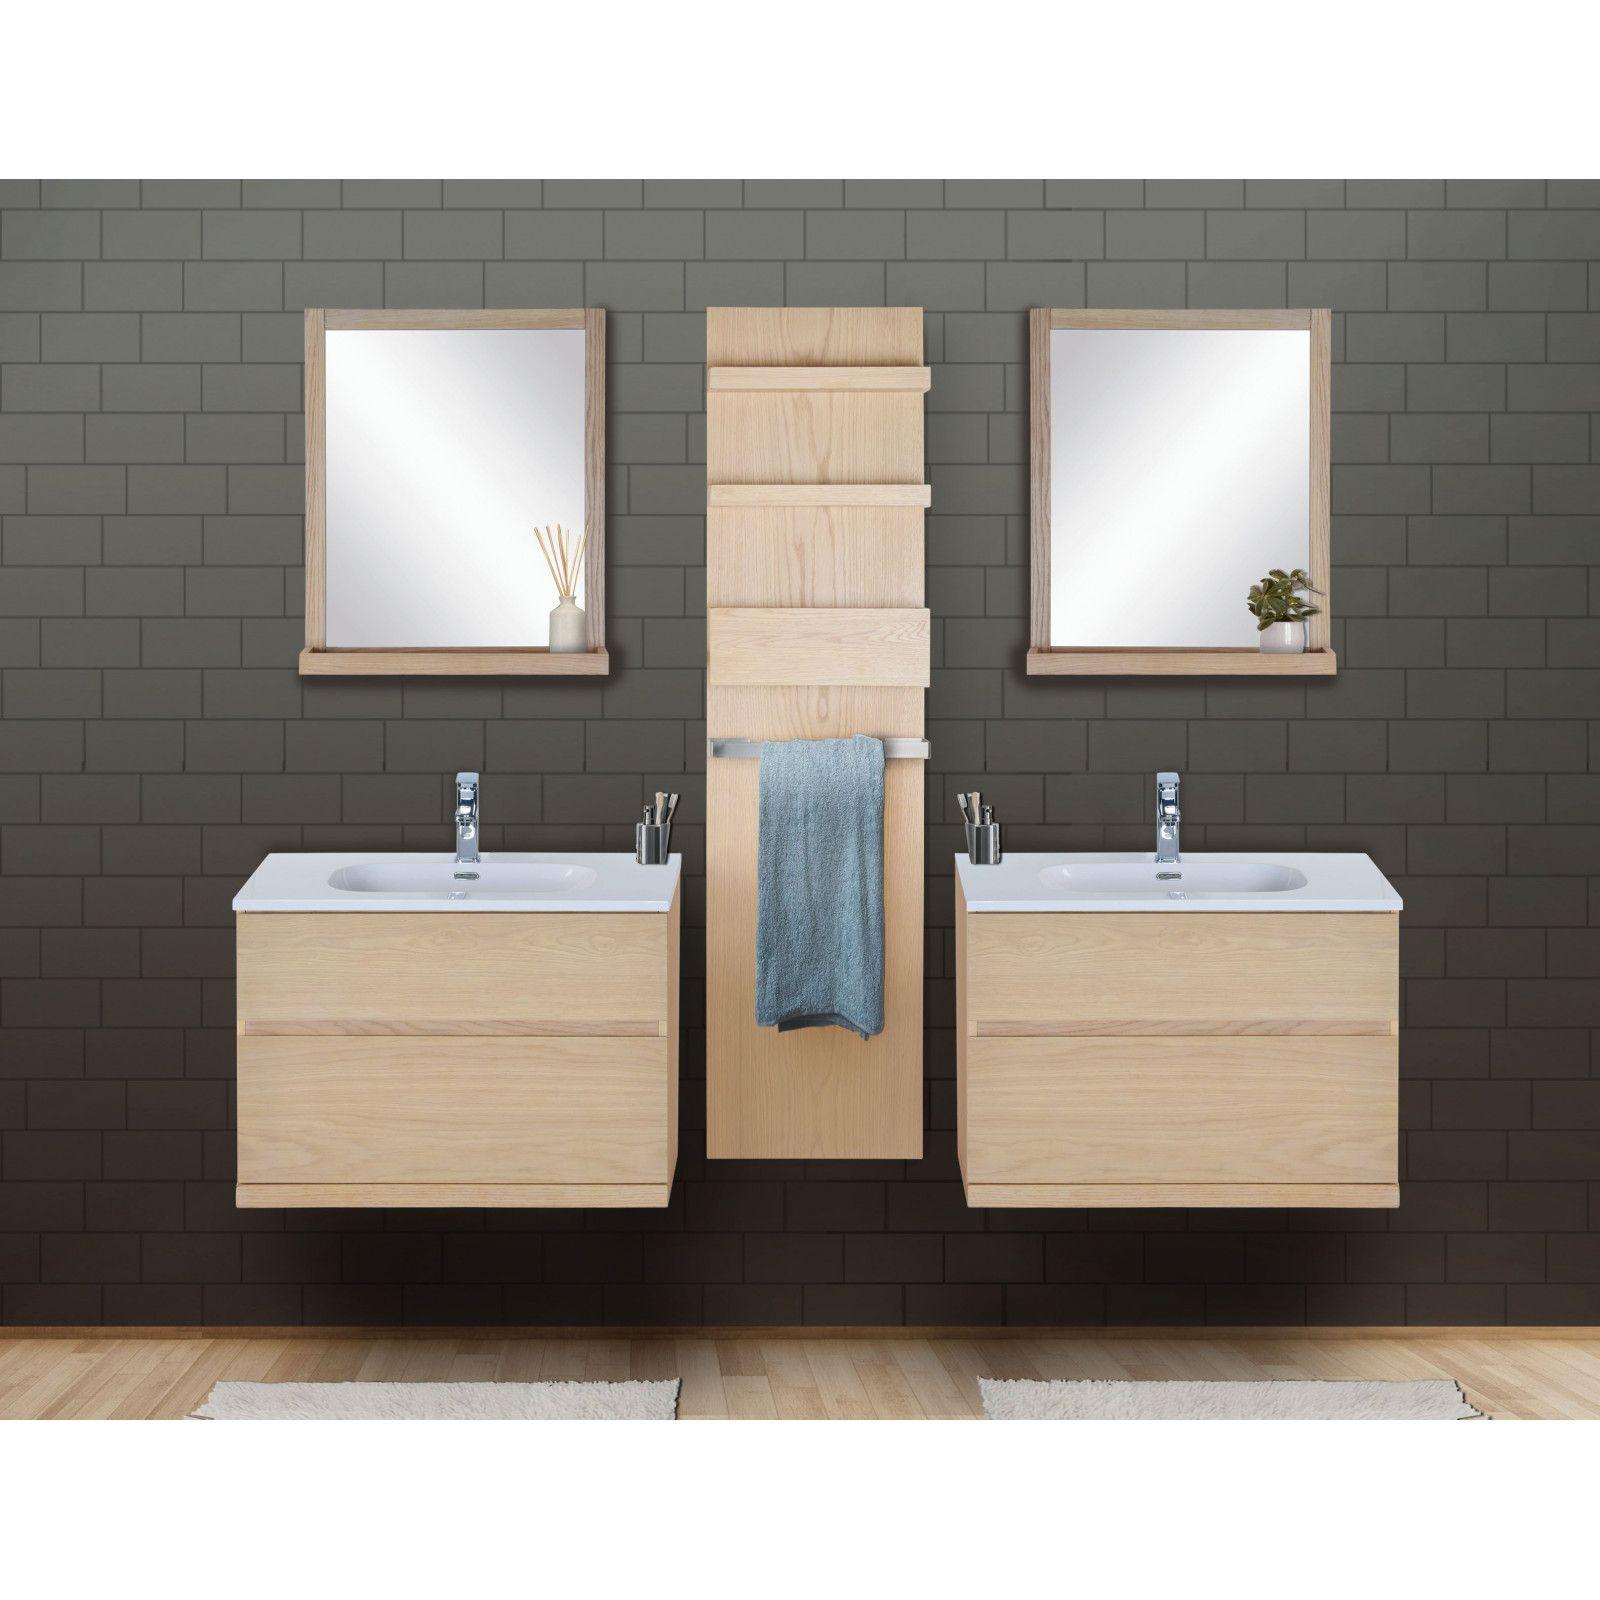 Ensemble salle de bain chêne 2 meubles 80 cm + 2 miroirs + 1 module rangement ENIO